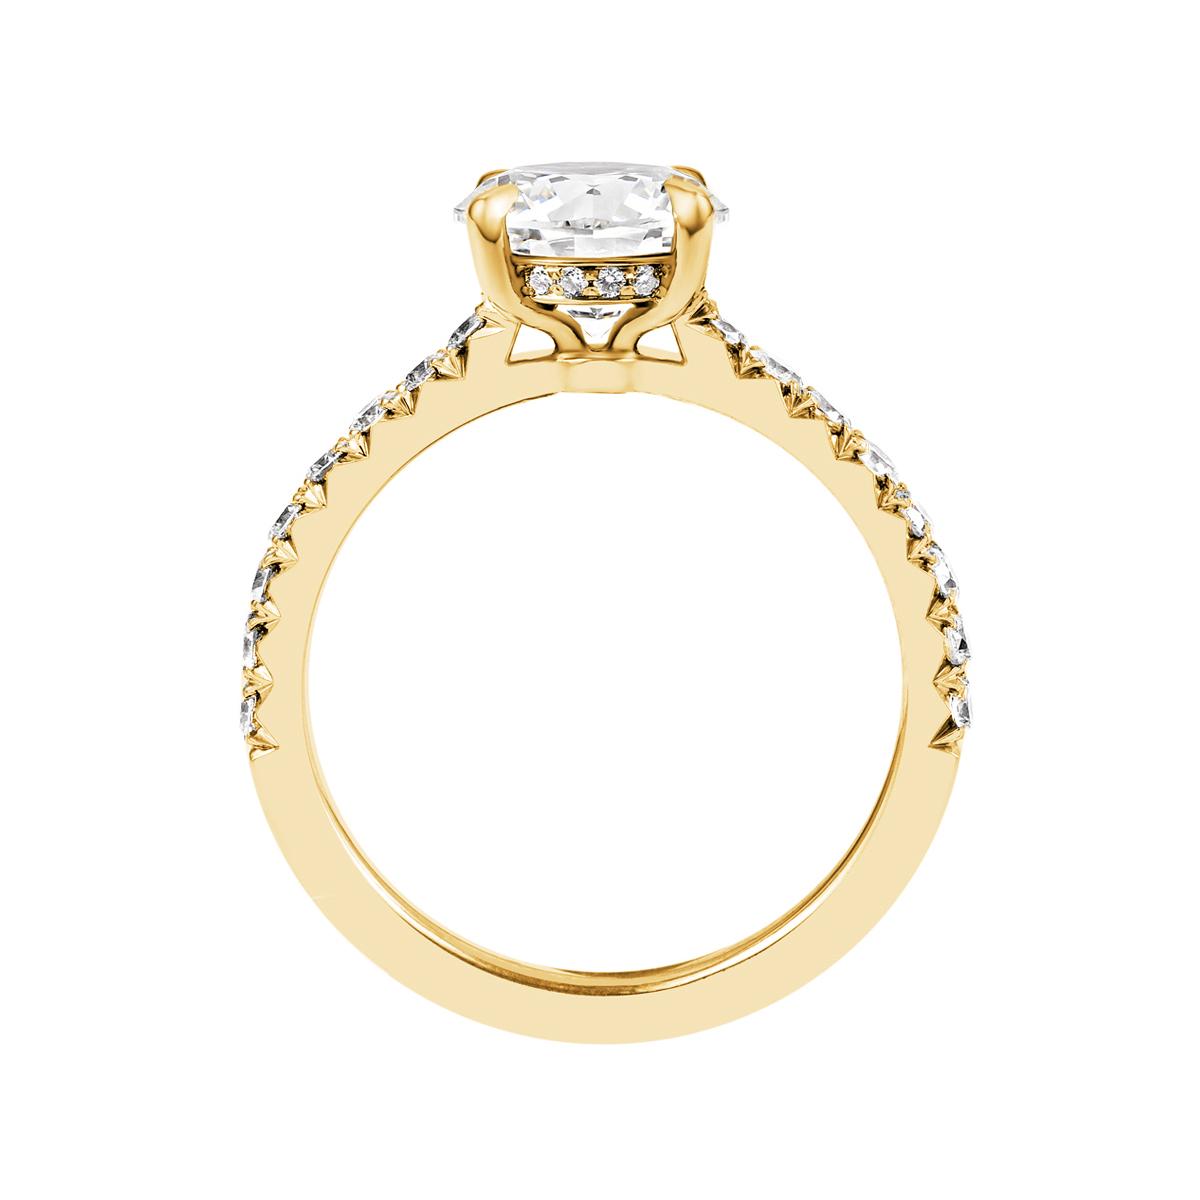 Round-frances-yellow-gold-diamond-set-engagement-ring-profile.jpg